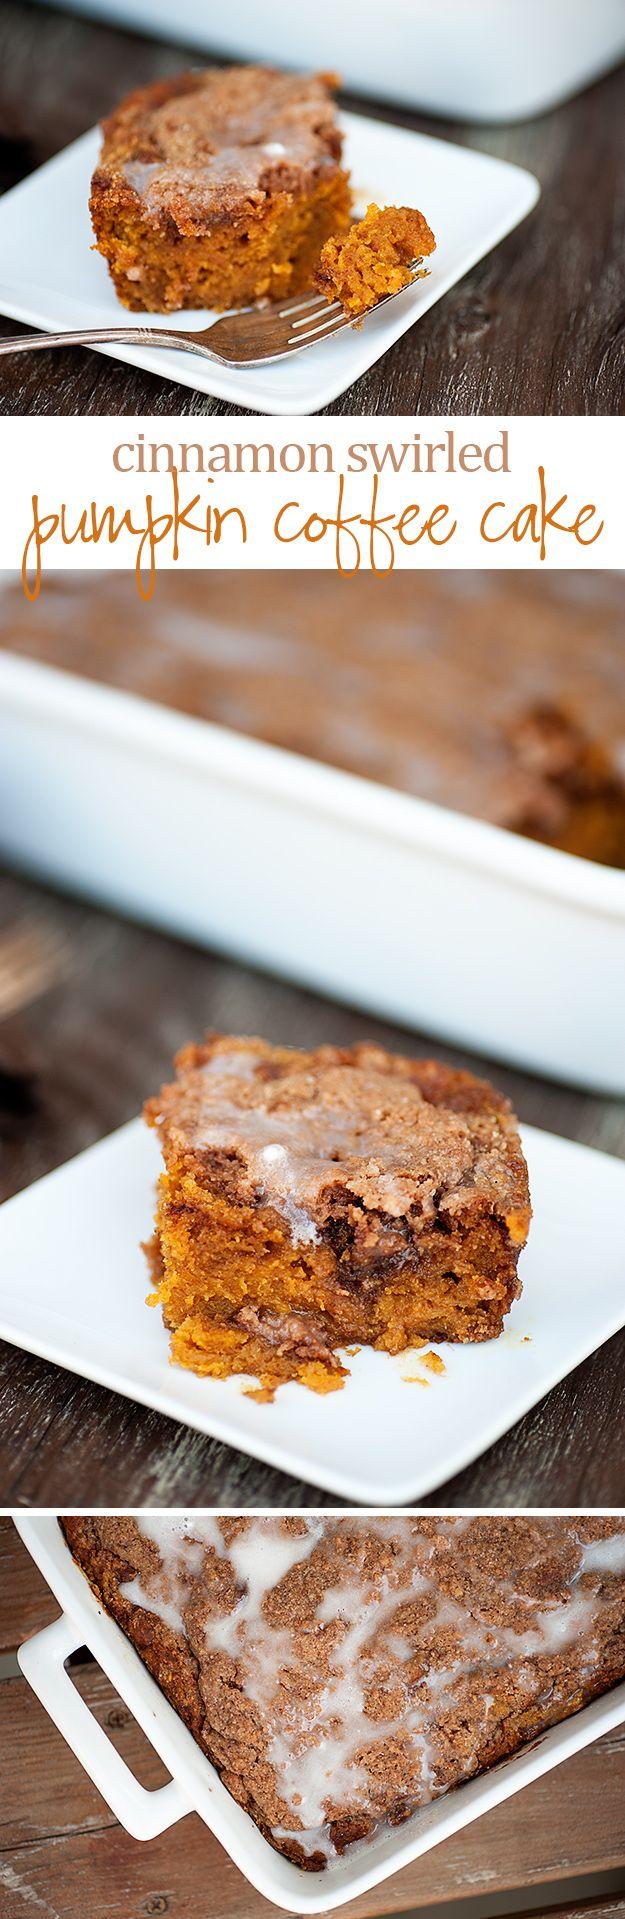 chrome hearts cufflinks Pumpkin coffee cake that is LOADED with pumpkin and swirled with cinnamon